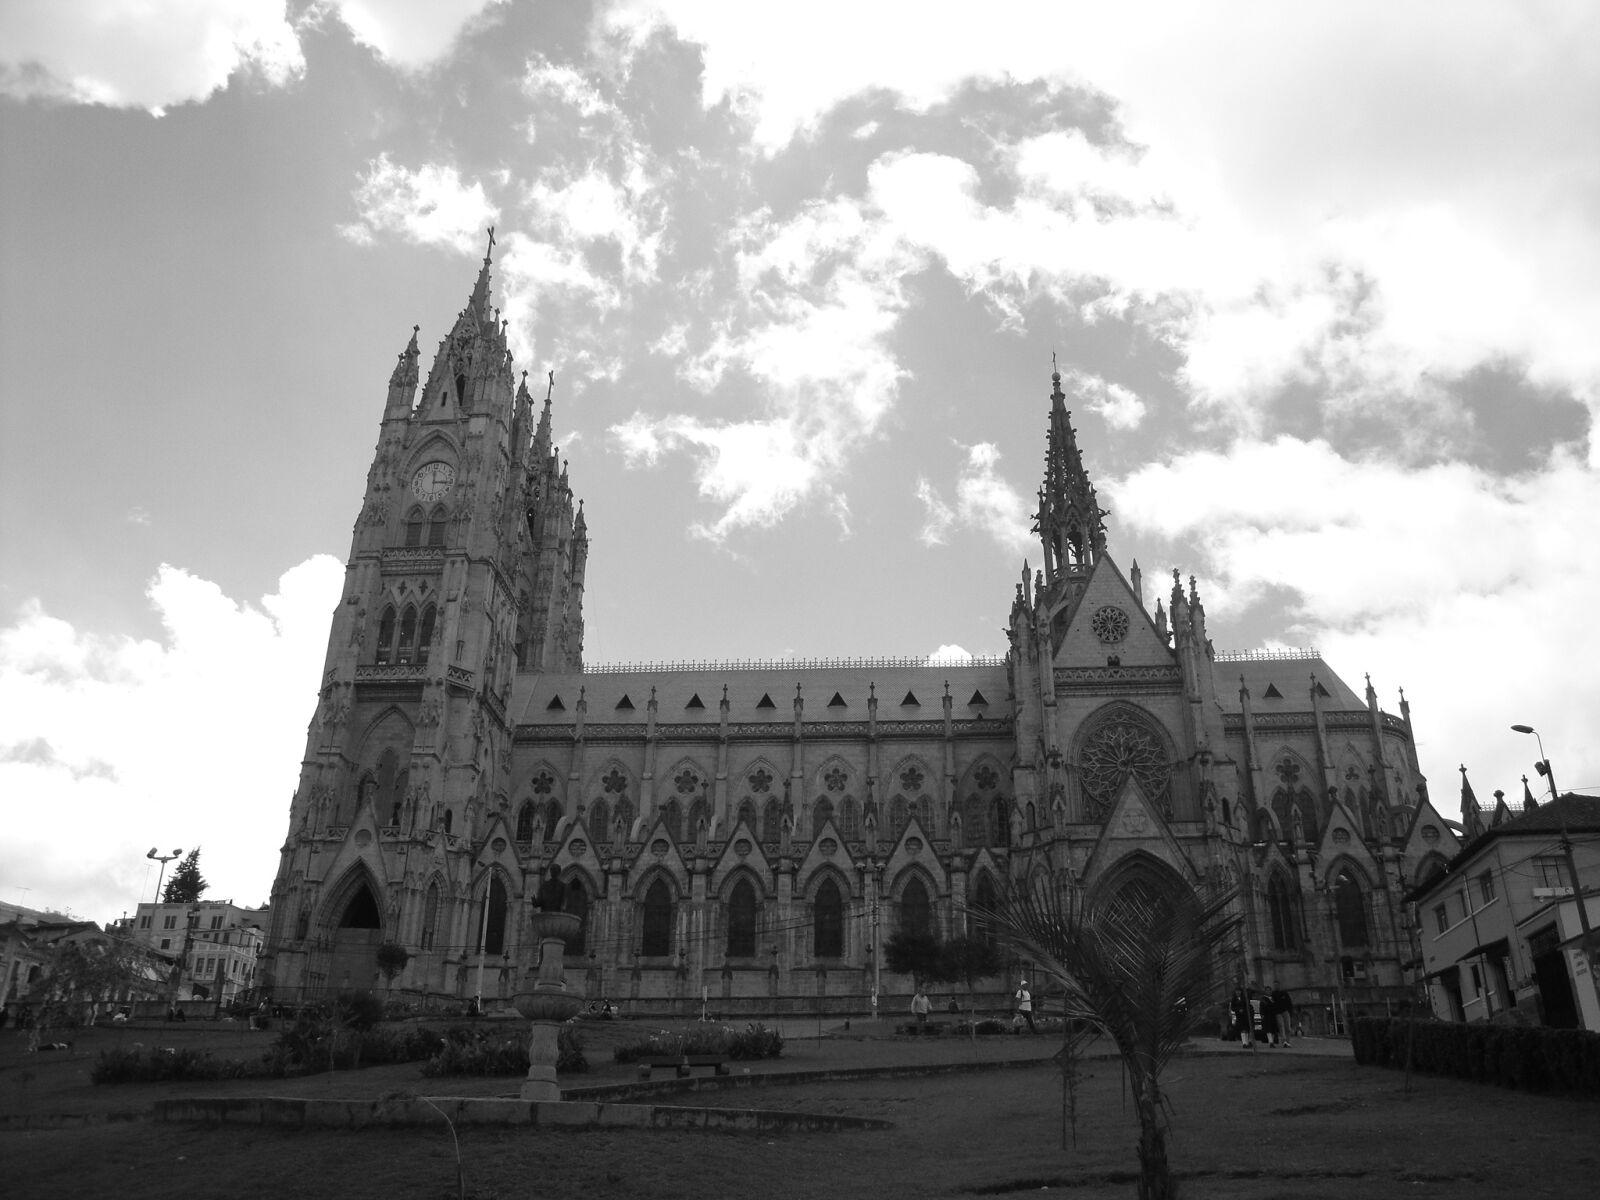 basilica, church, architecture